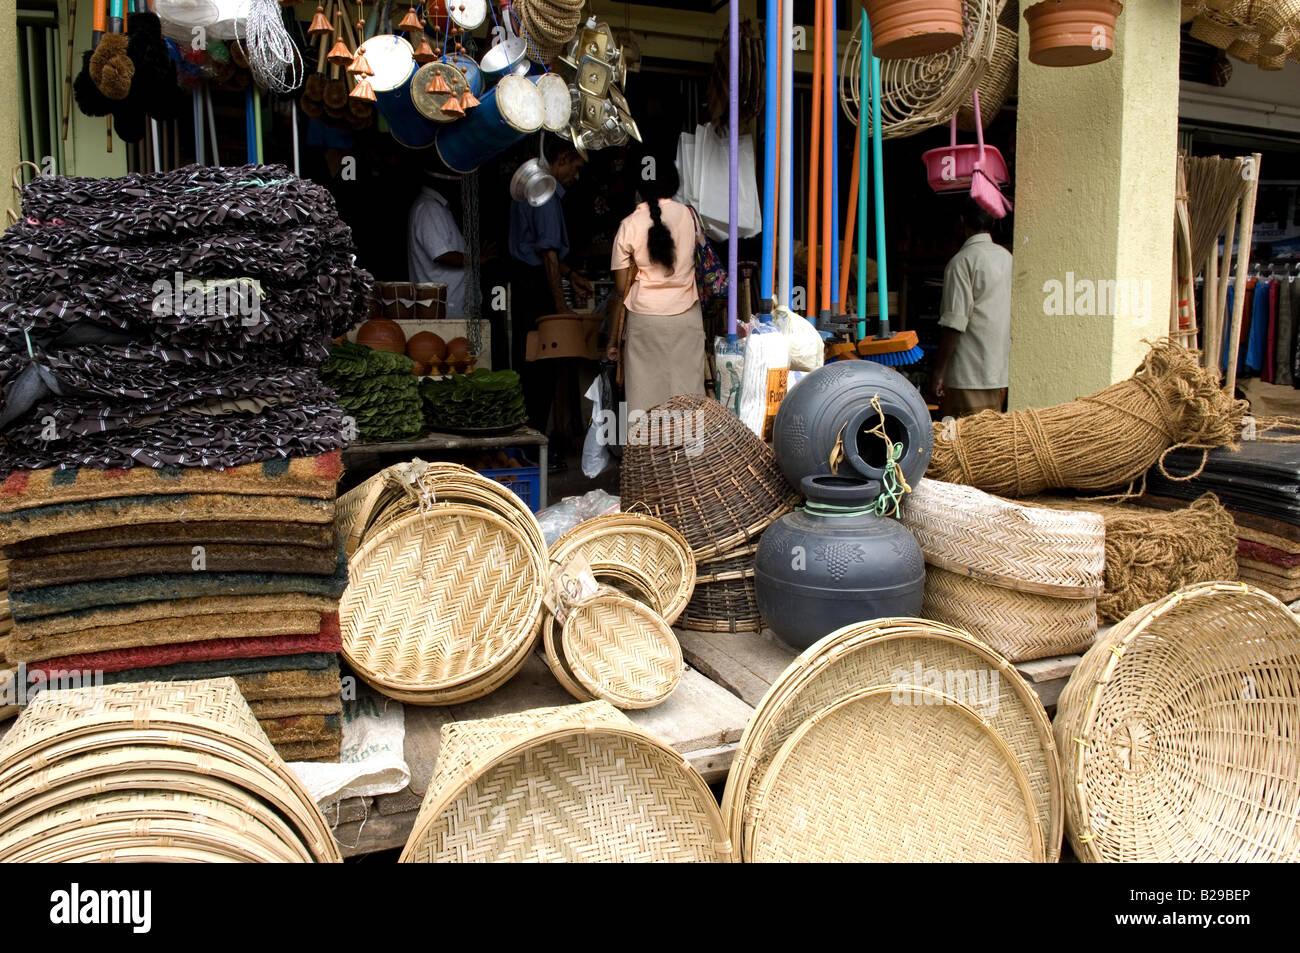 Aluthgama Sri Lanka Date 20 04 2008 Ref ZB648 115261 0007 COMPULSORY CREDIT World Pictures Photoshot - Stock Image